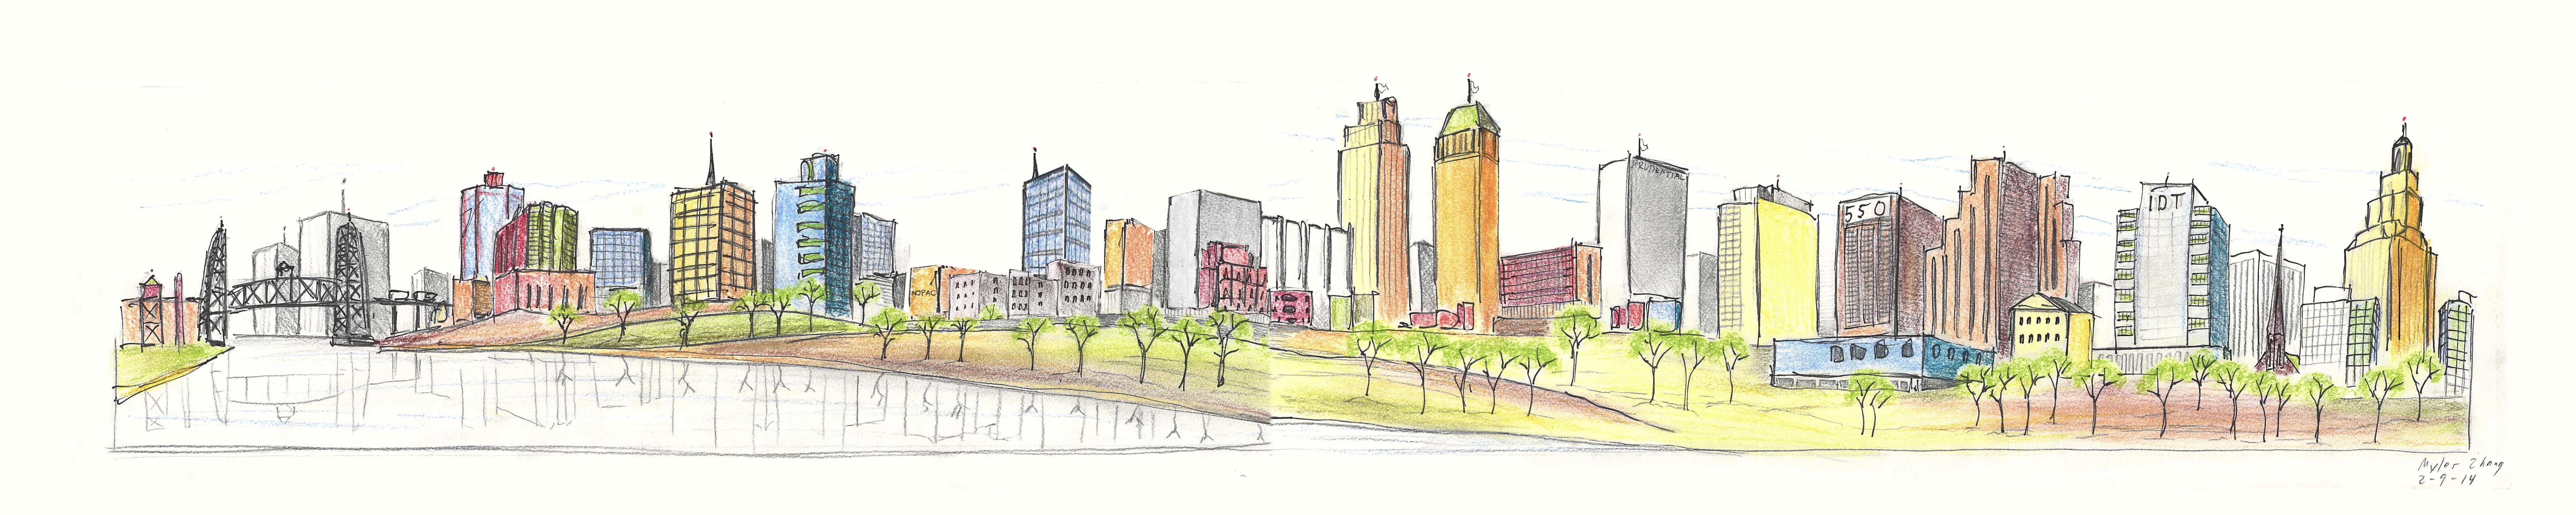 Newark Waterfront